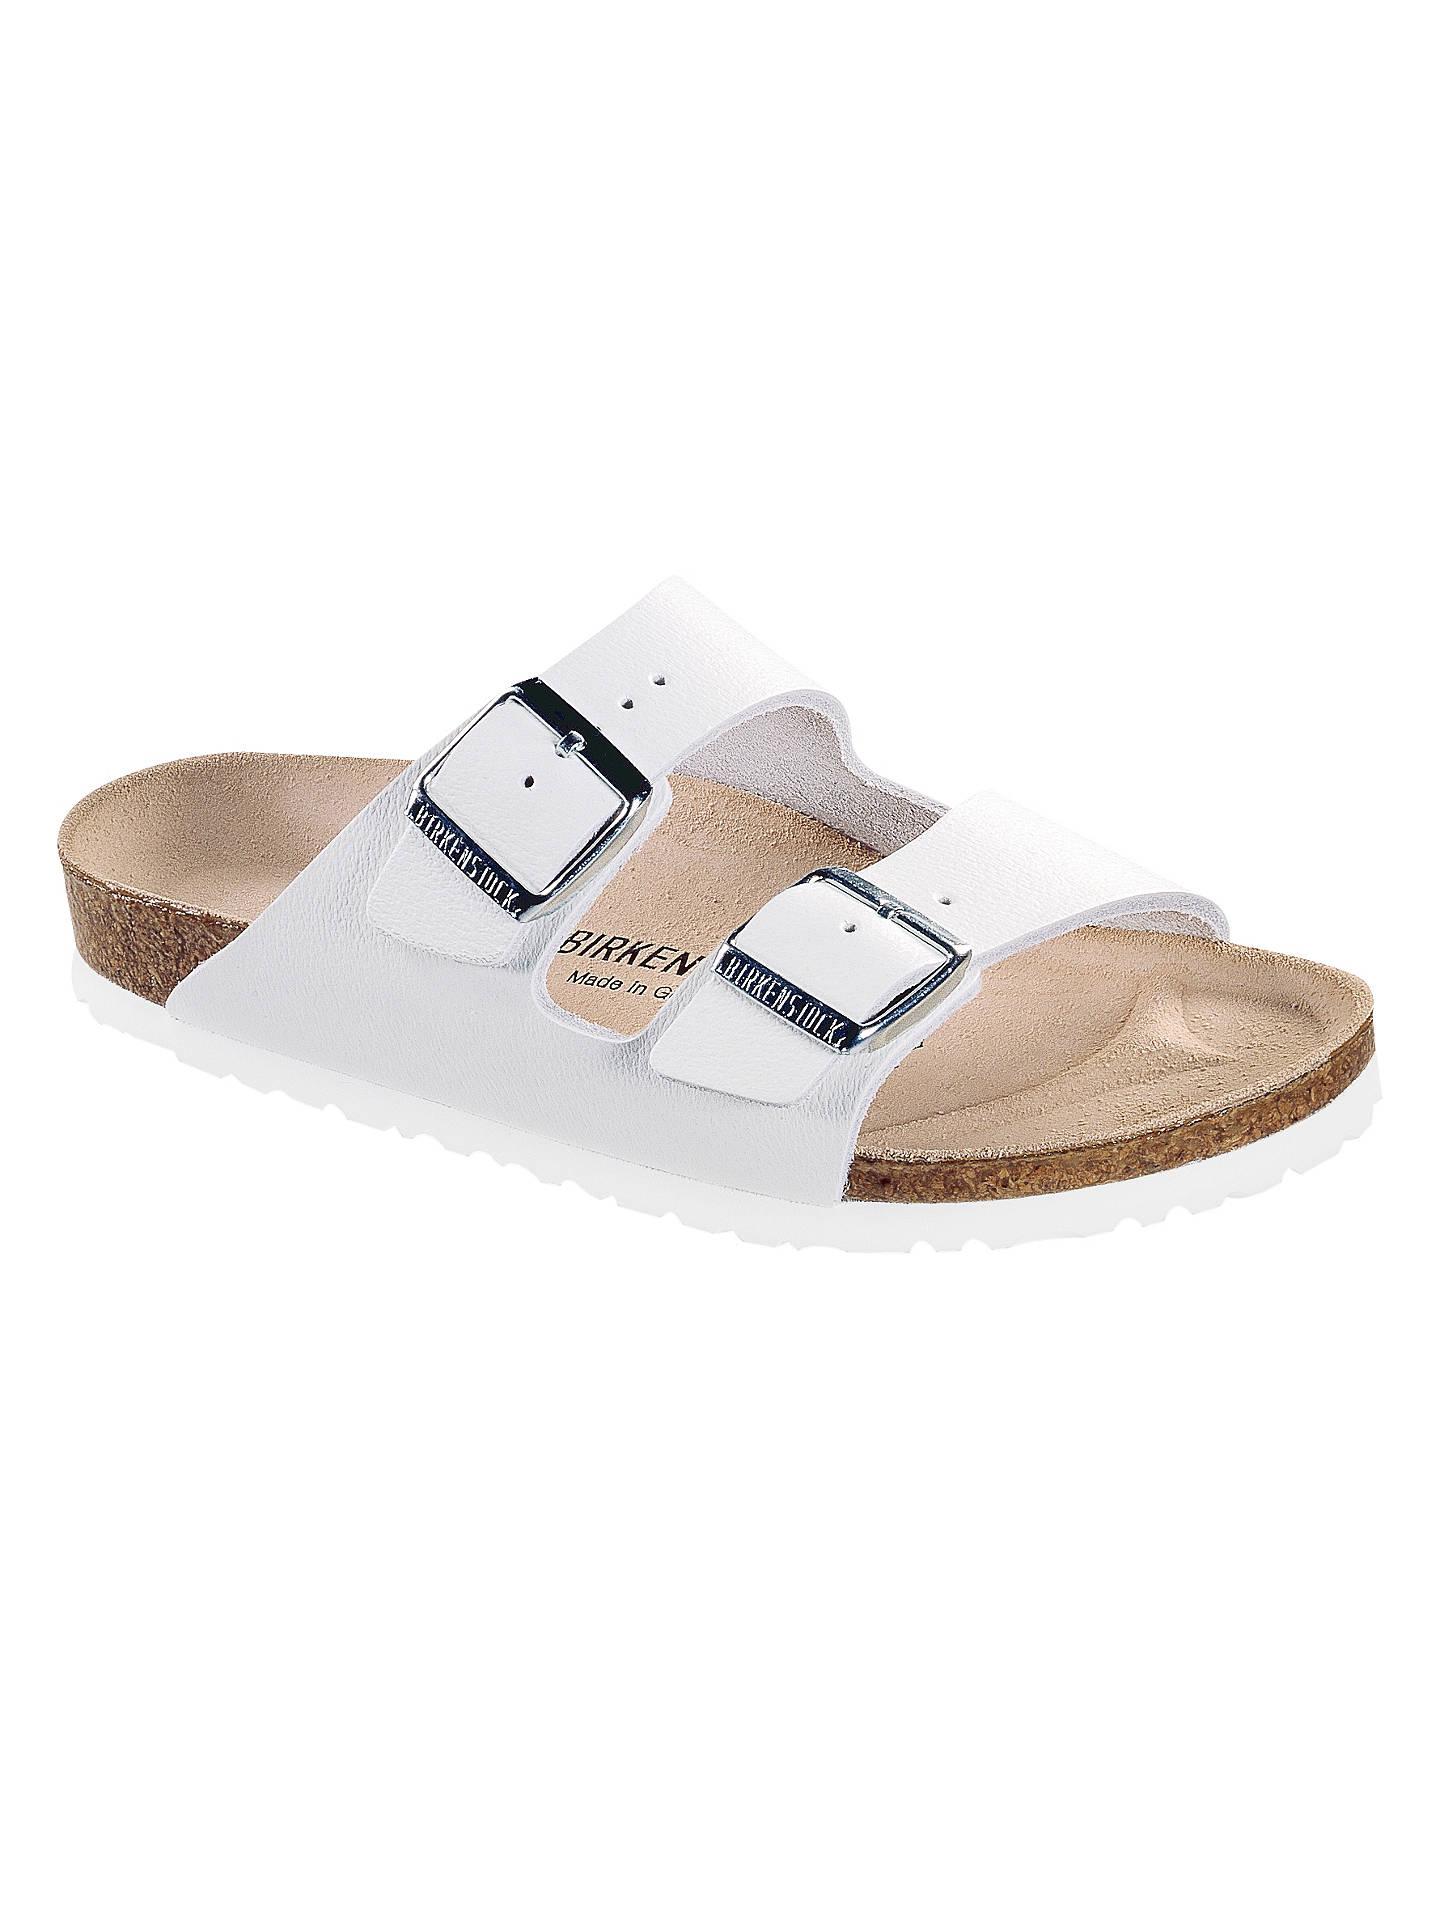 791a62d4b Buy Birkenstock Arizona Double Strap Slider Sandals, White Leather, 3  Online at johnlewis.